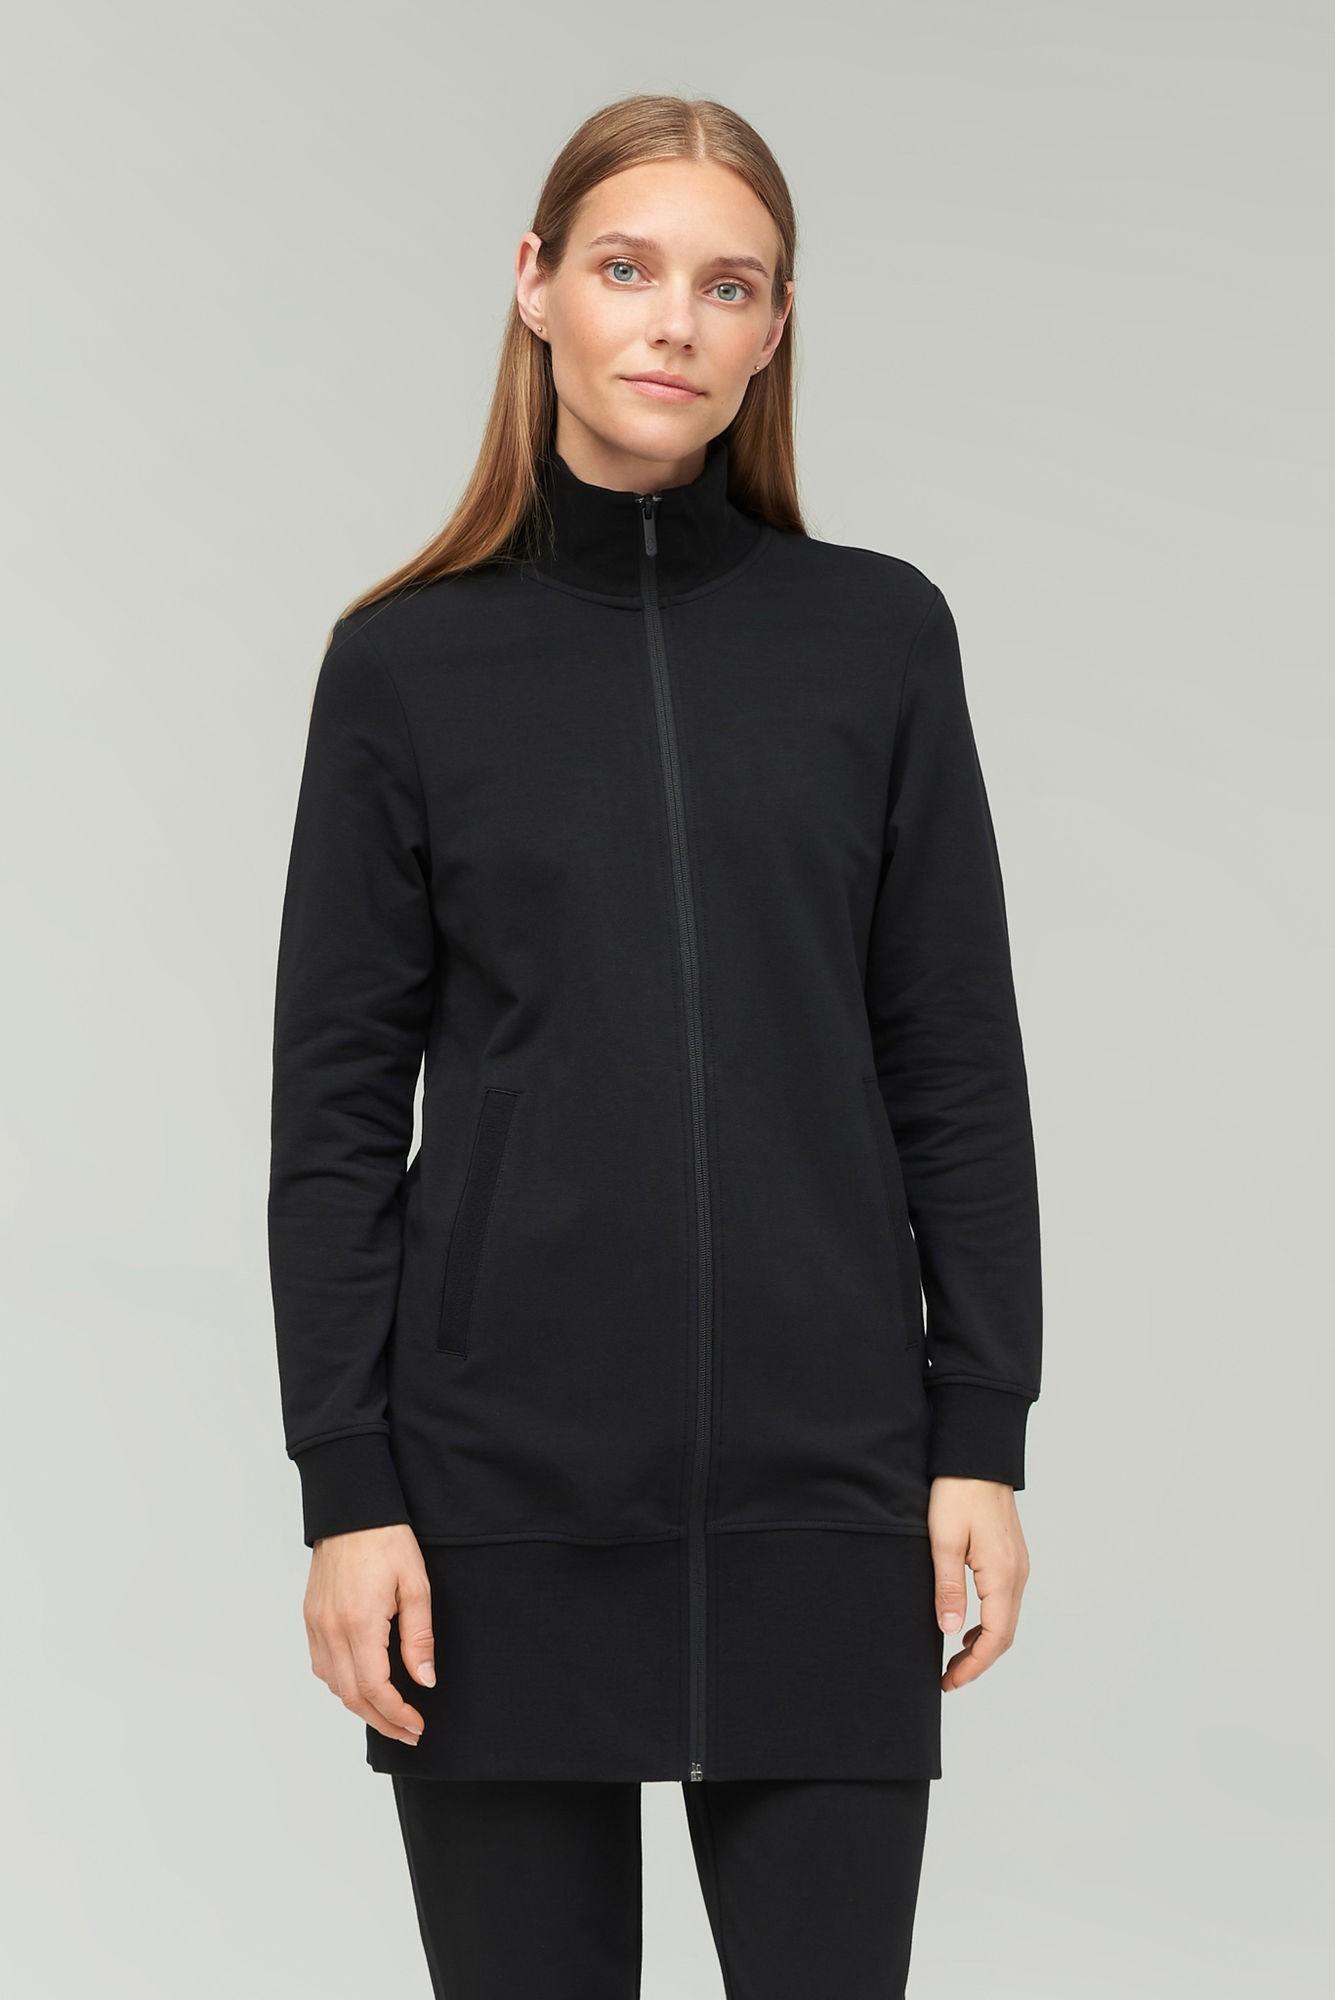 AUDIMAS Atseg.ilgas medvilninis džemperis 2021-219 Black L